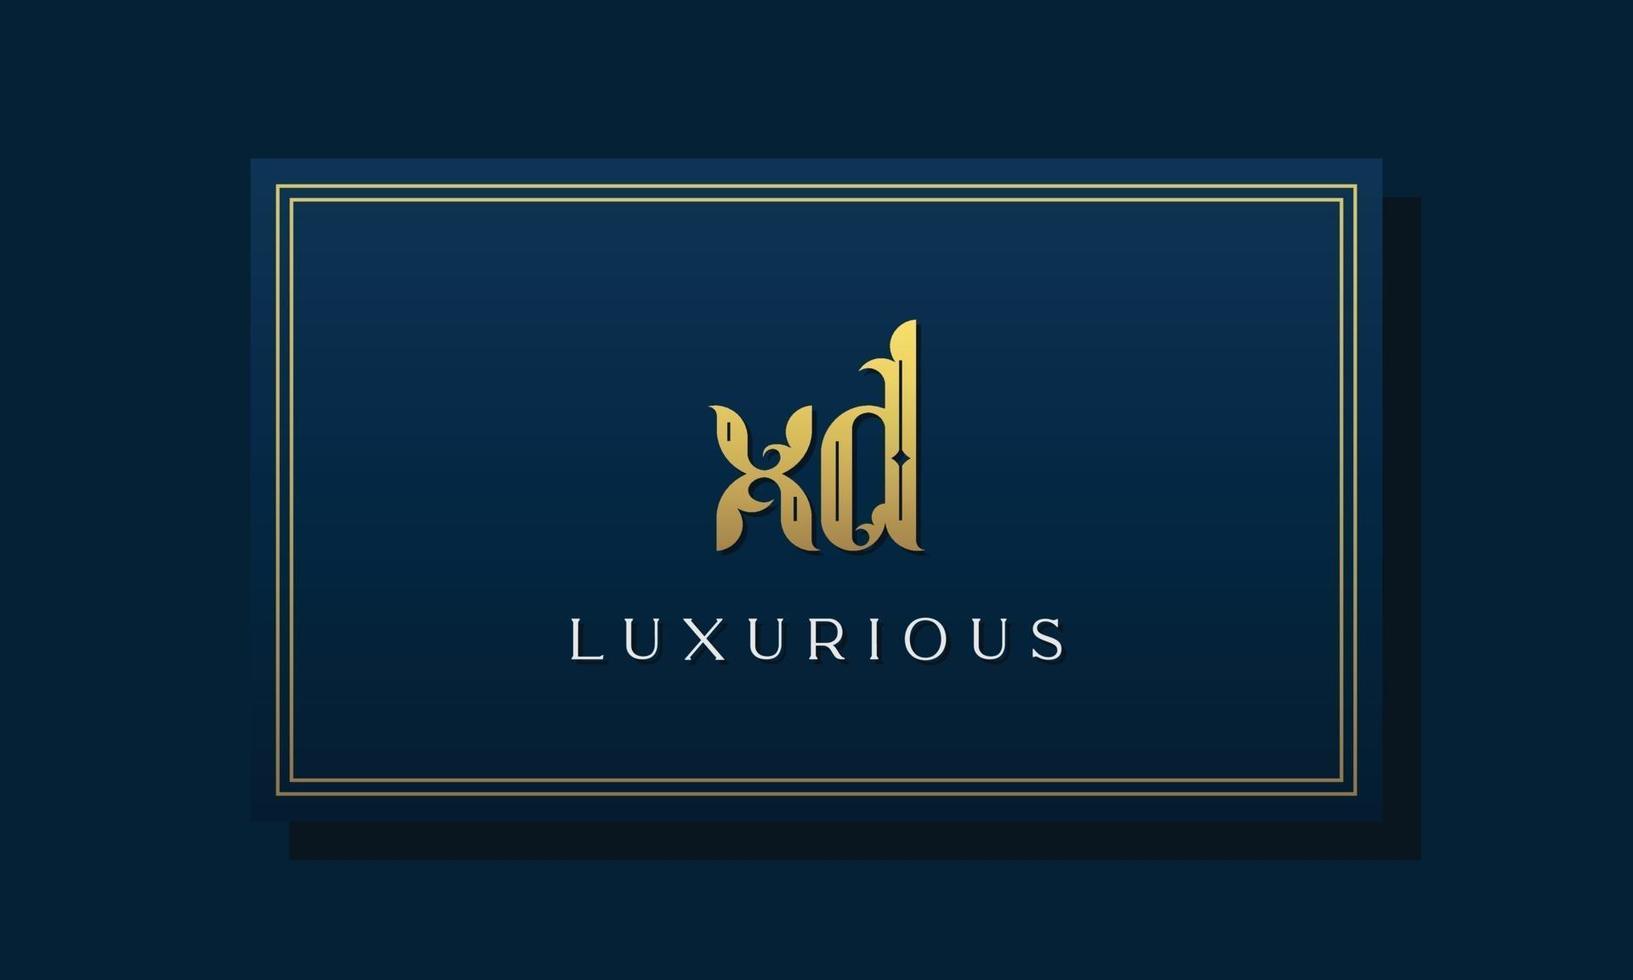 logotipo vintage real letras iniciais xd. vetor